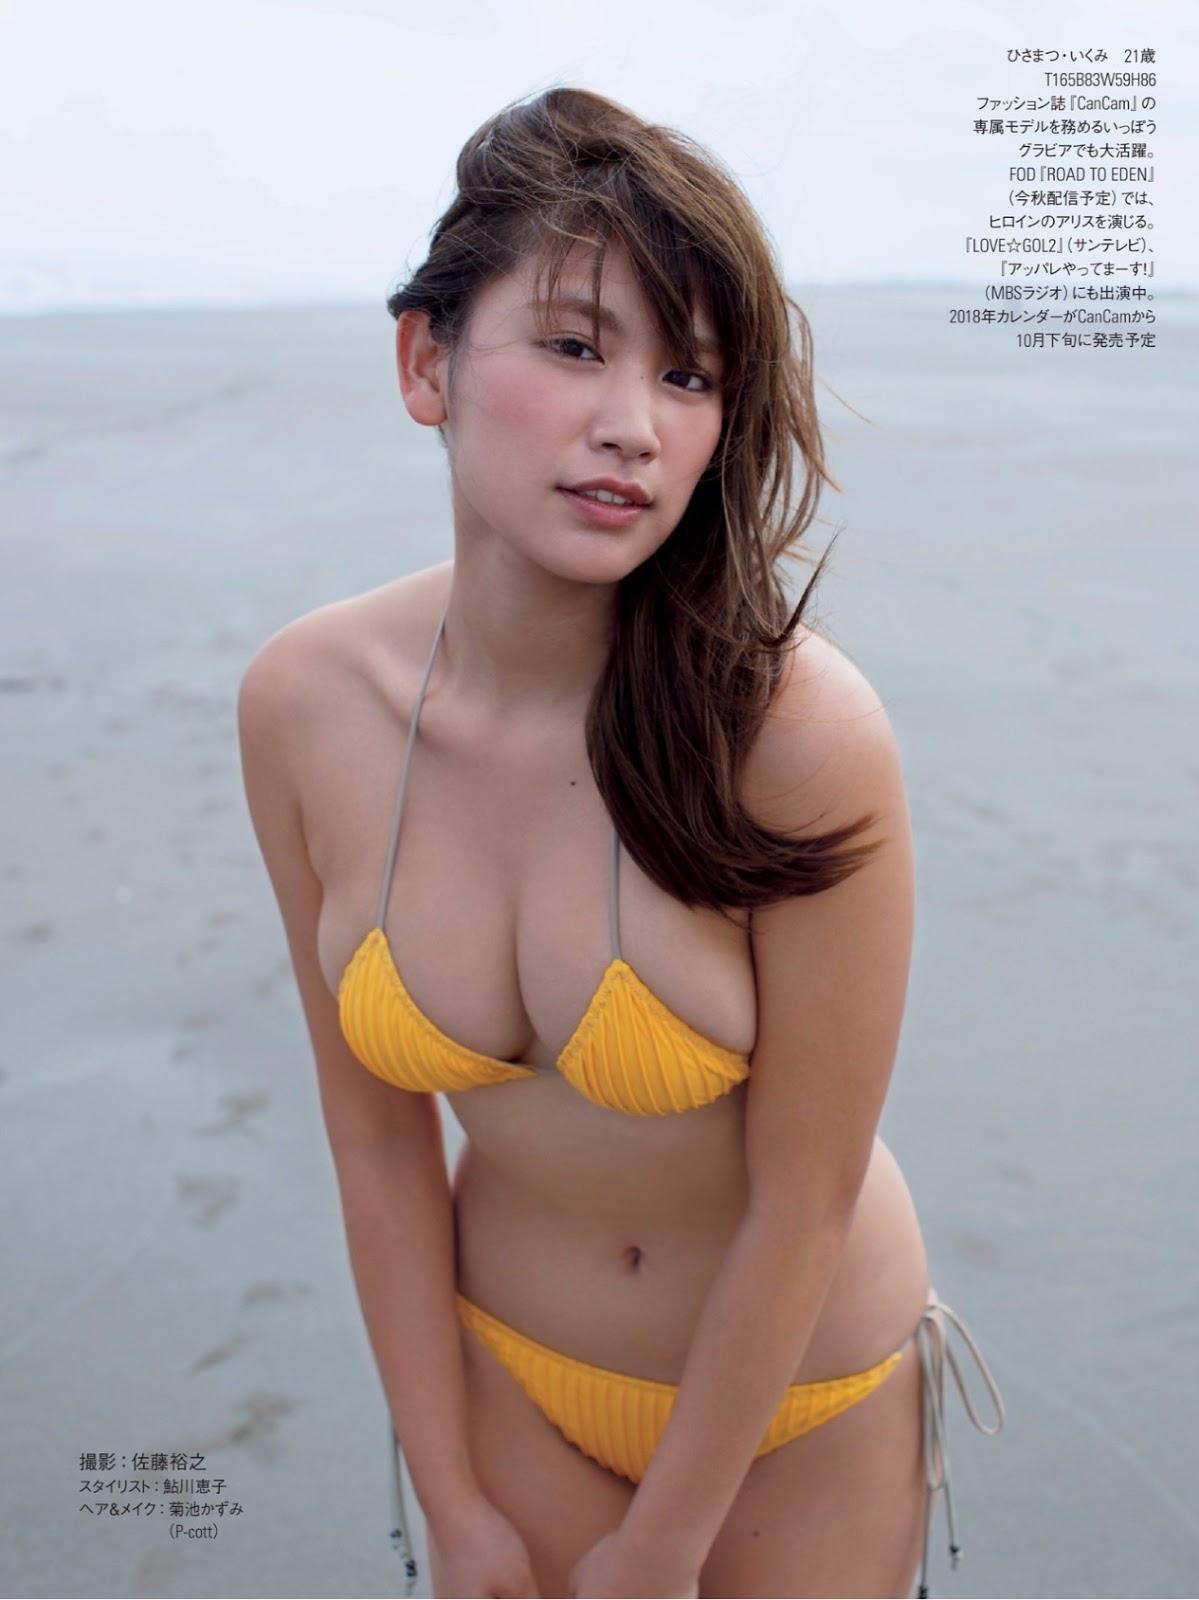 Hisamatsu Ikumi 久松郁実, FRIDAY 2017.08.18 (フライデー 2017年08月18日号)